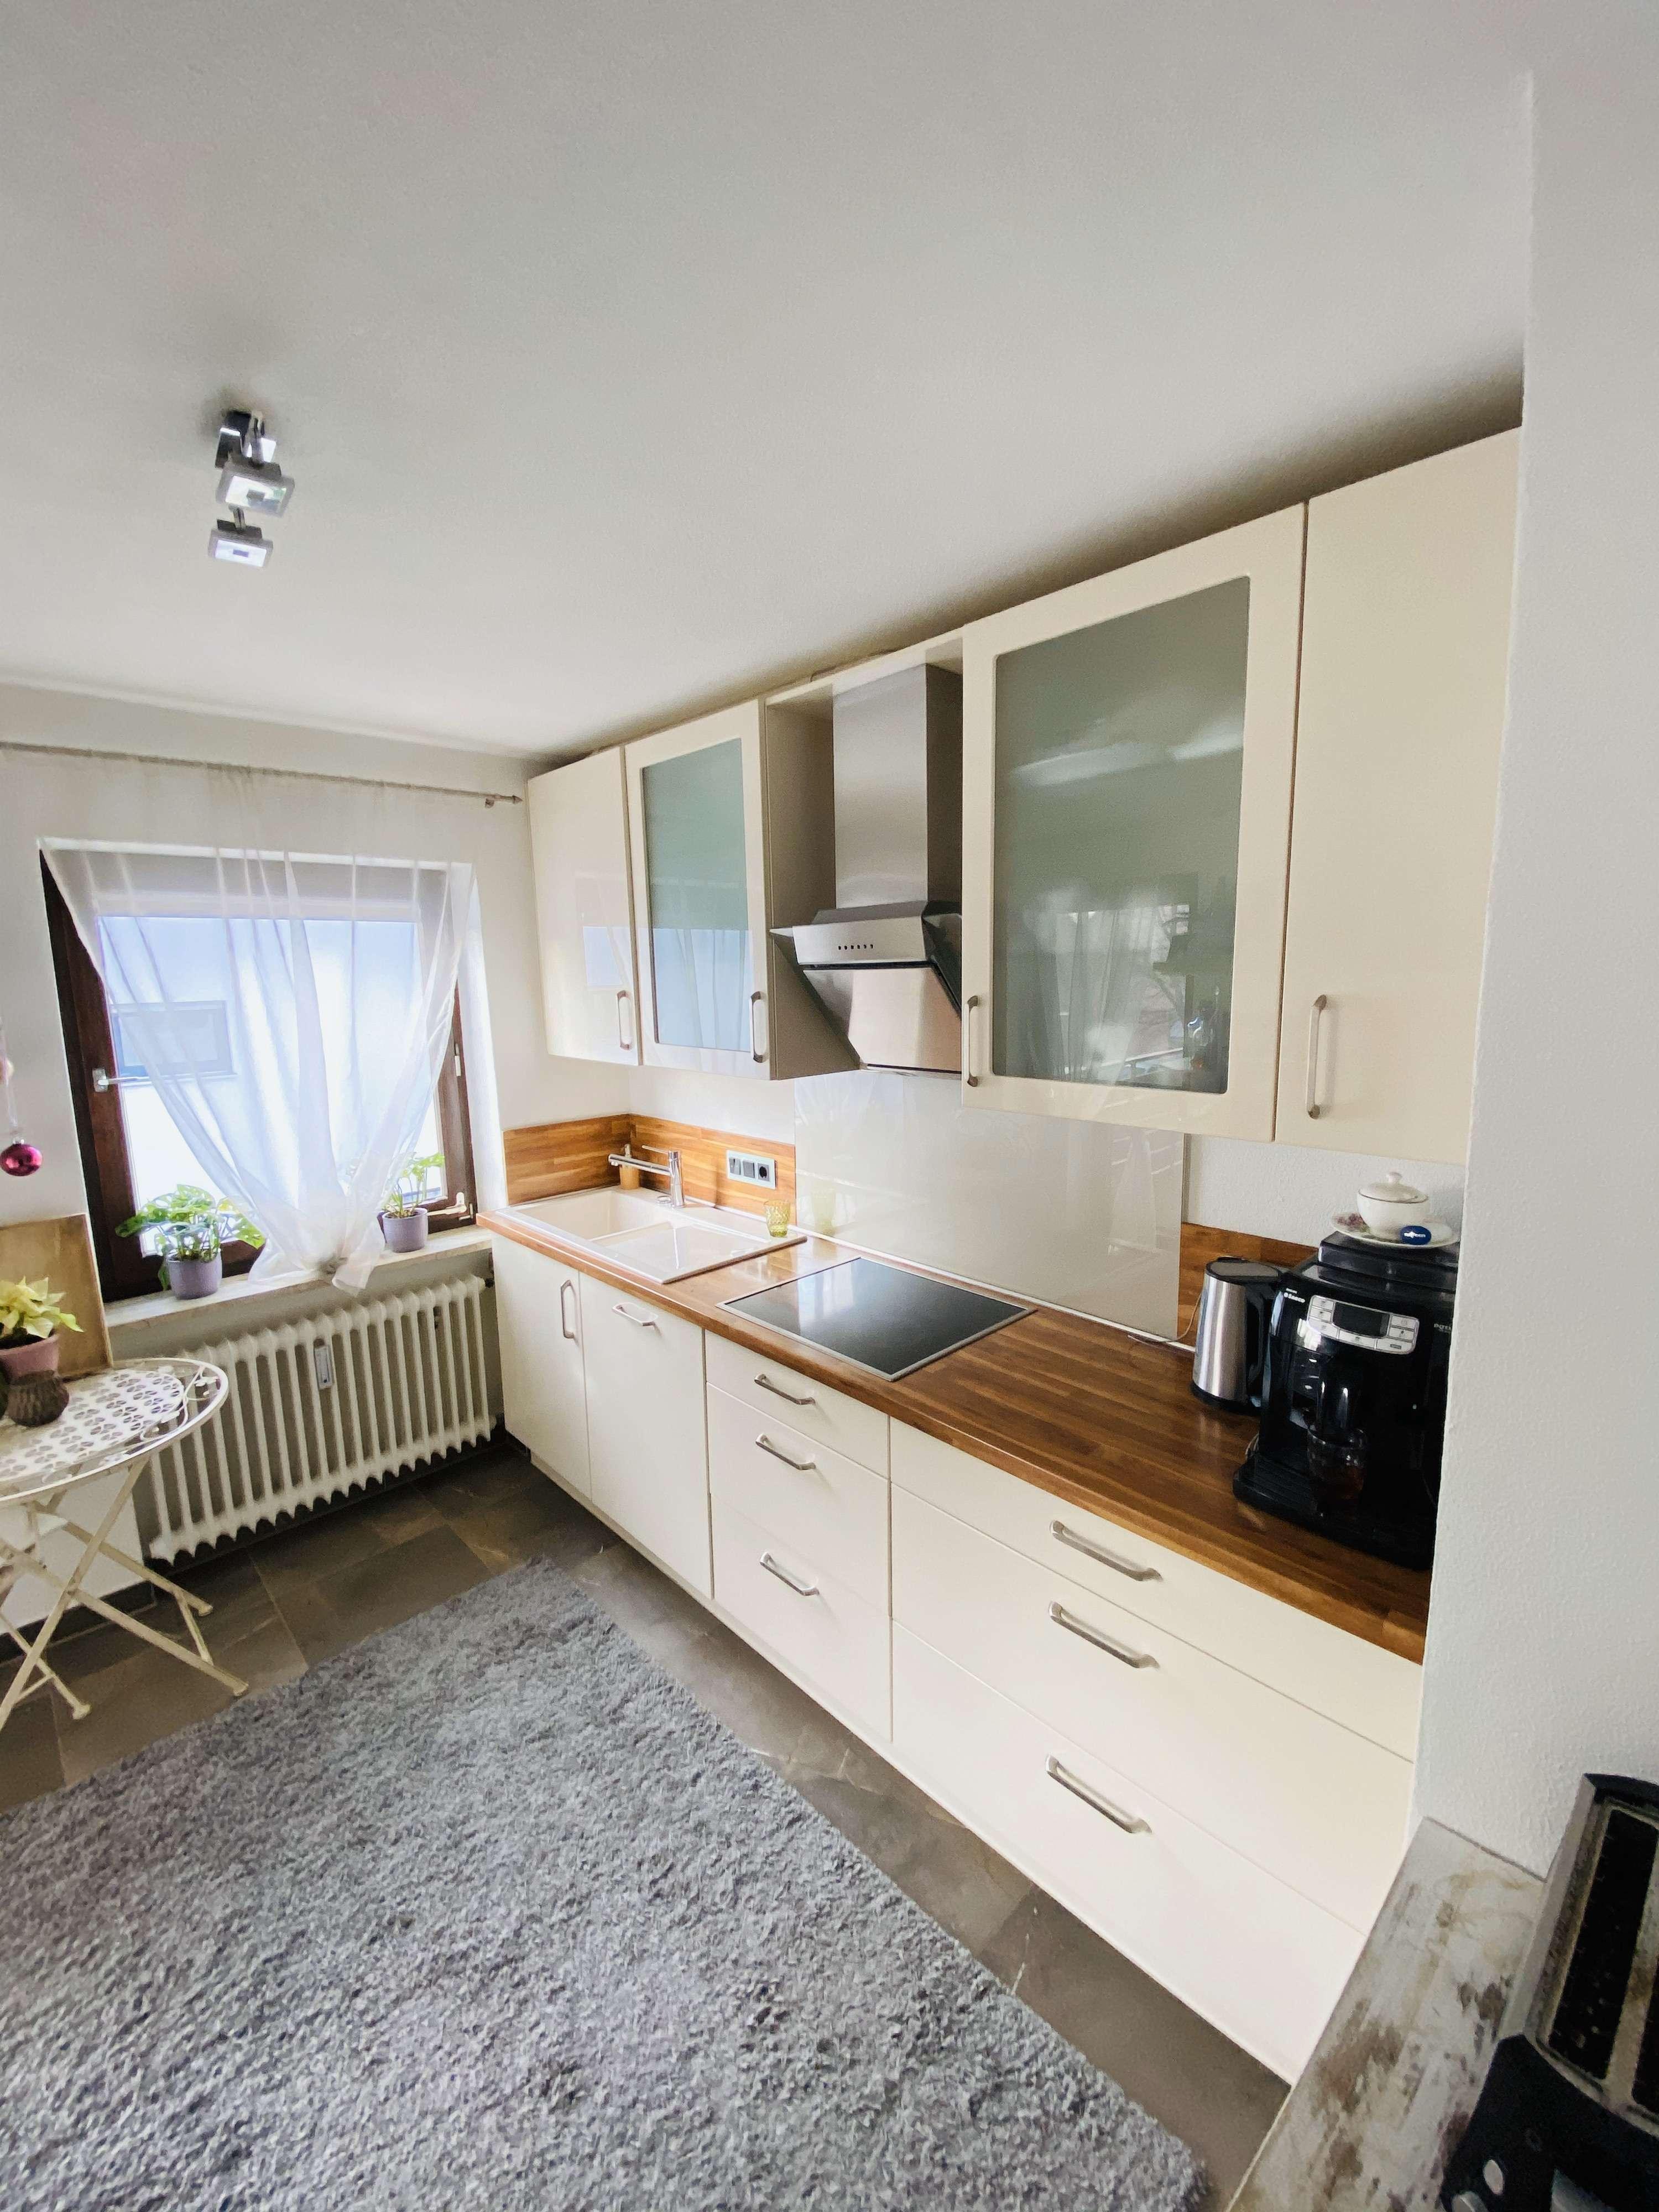 1.365 €, 91 m², 3 Zimmer in Karlsfeld (Dachau)